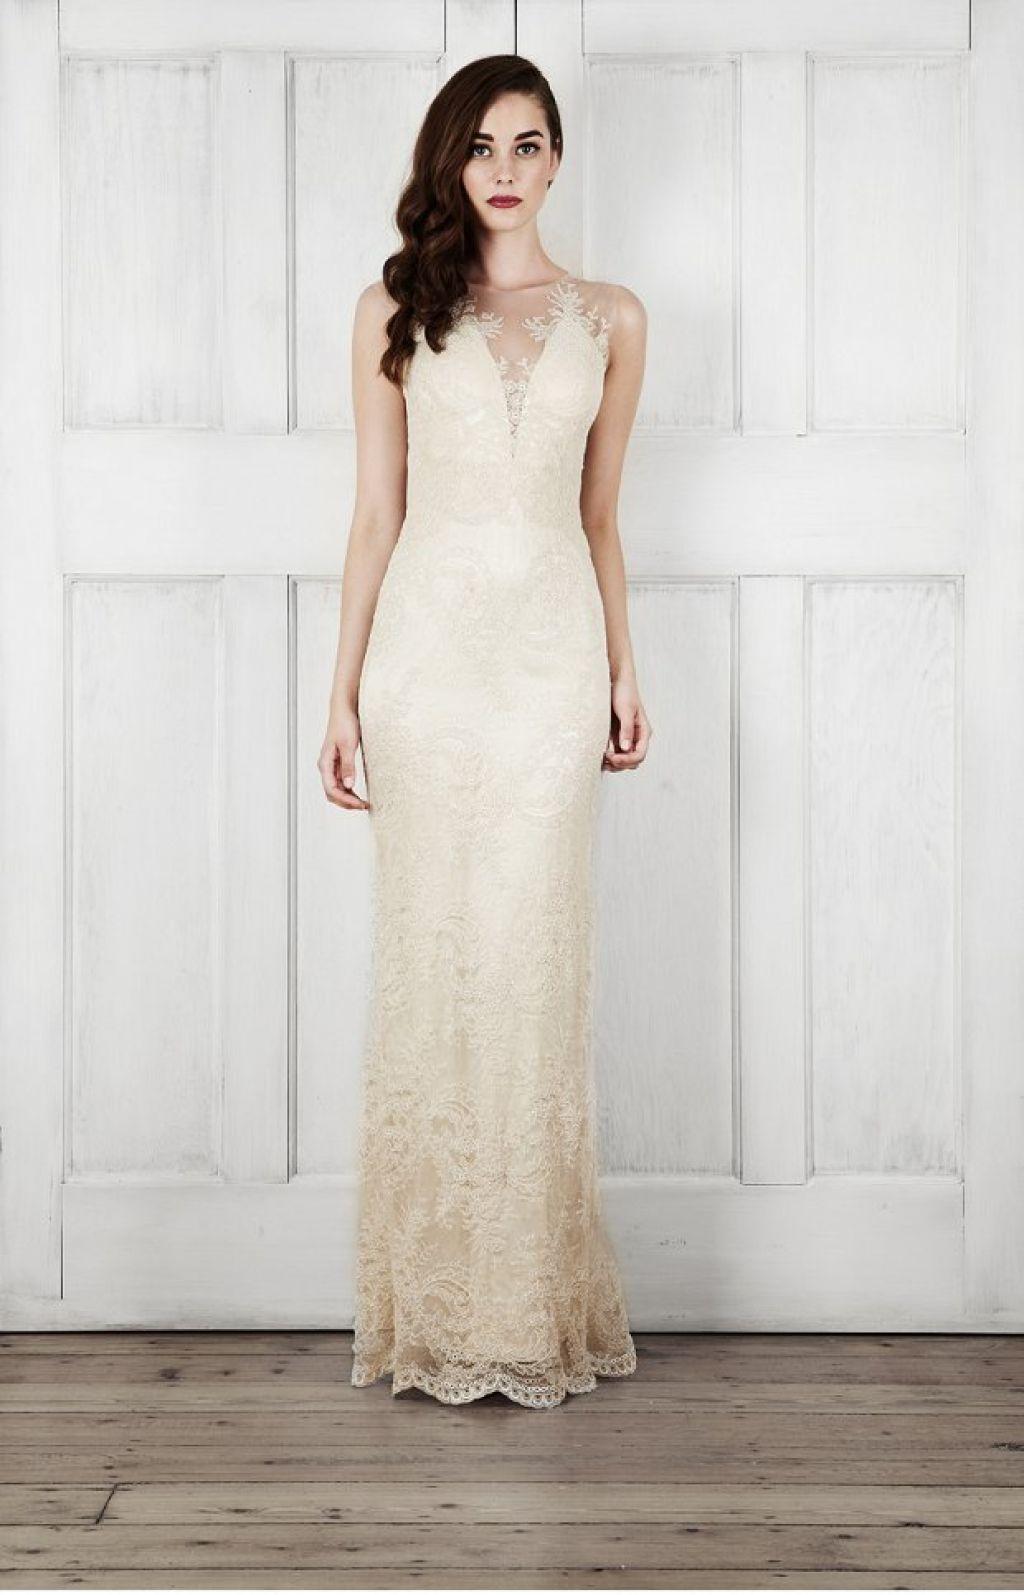 24 Inspirational Cream And Gold Wedding Dress 2015 Wedding Dresses